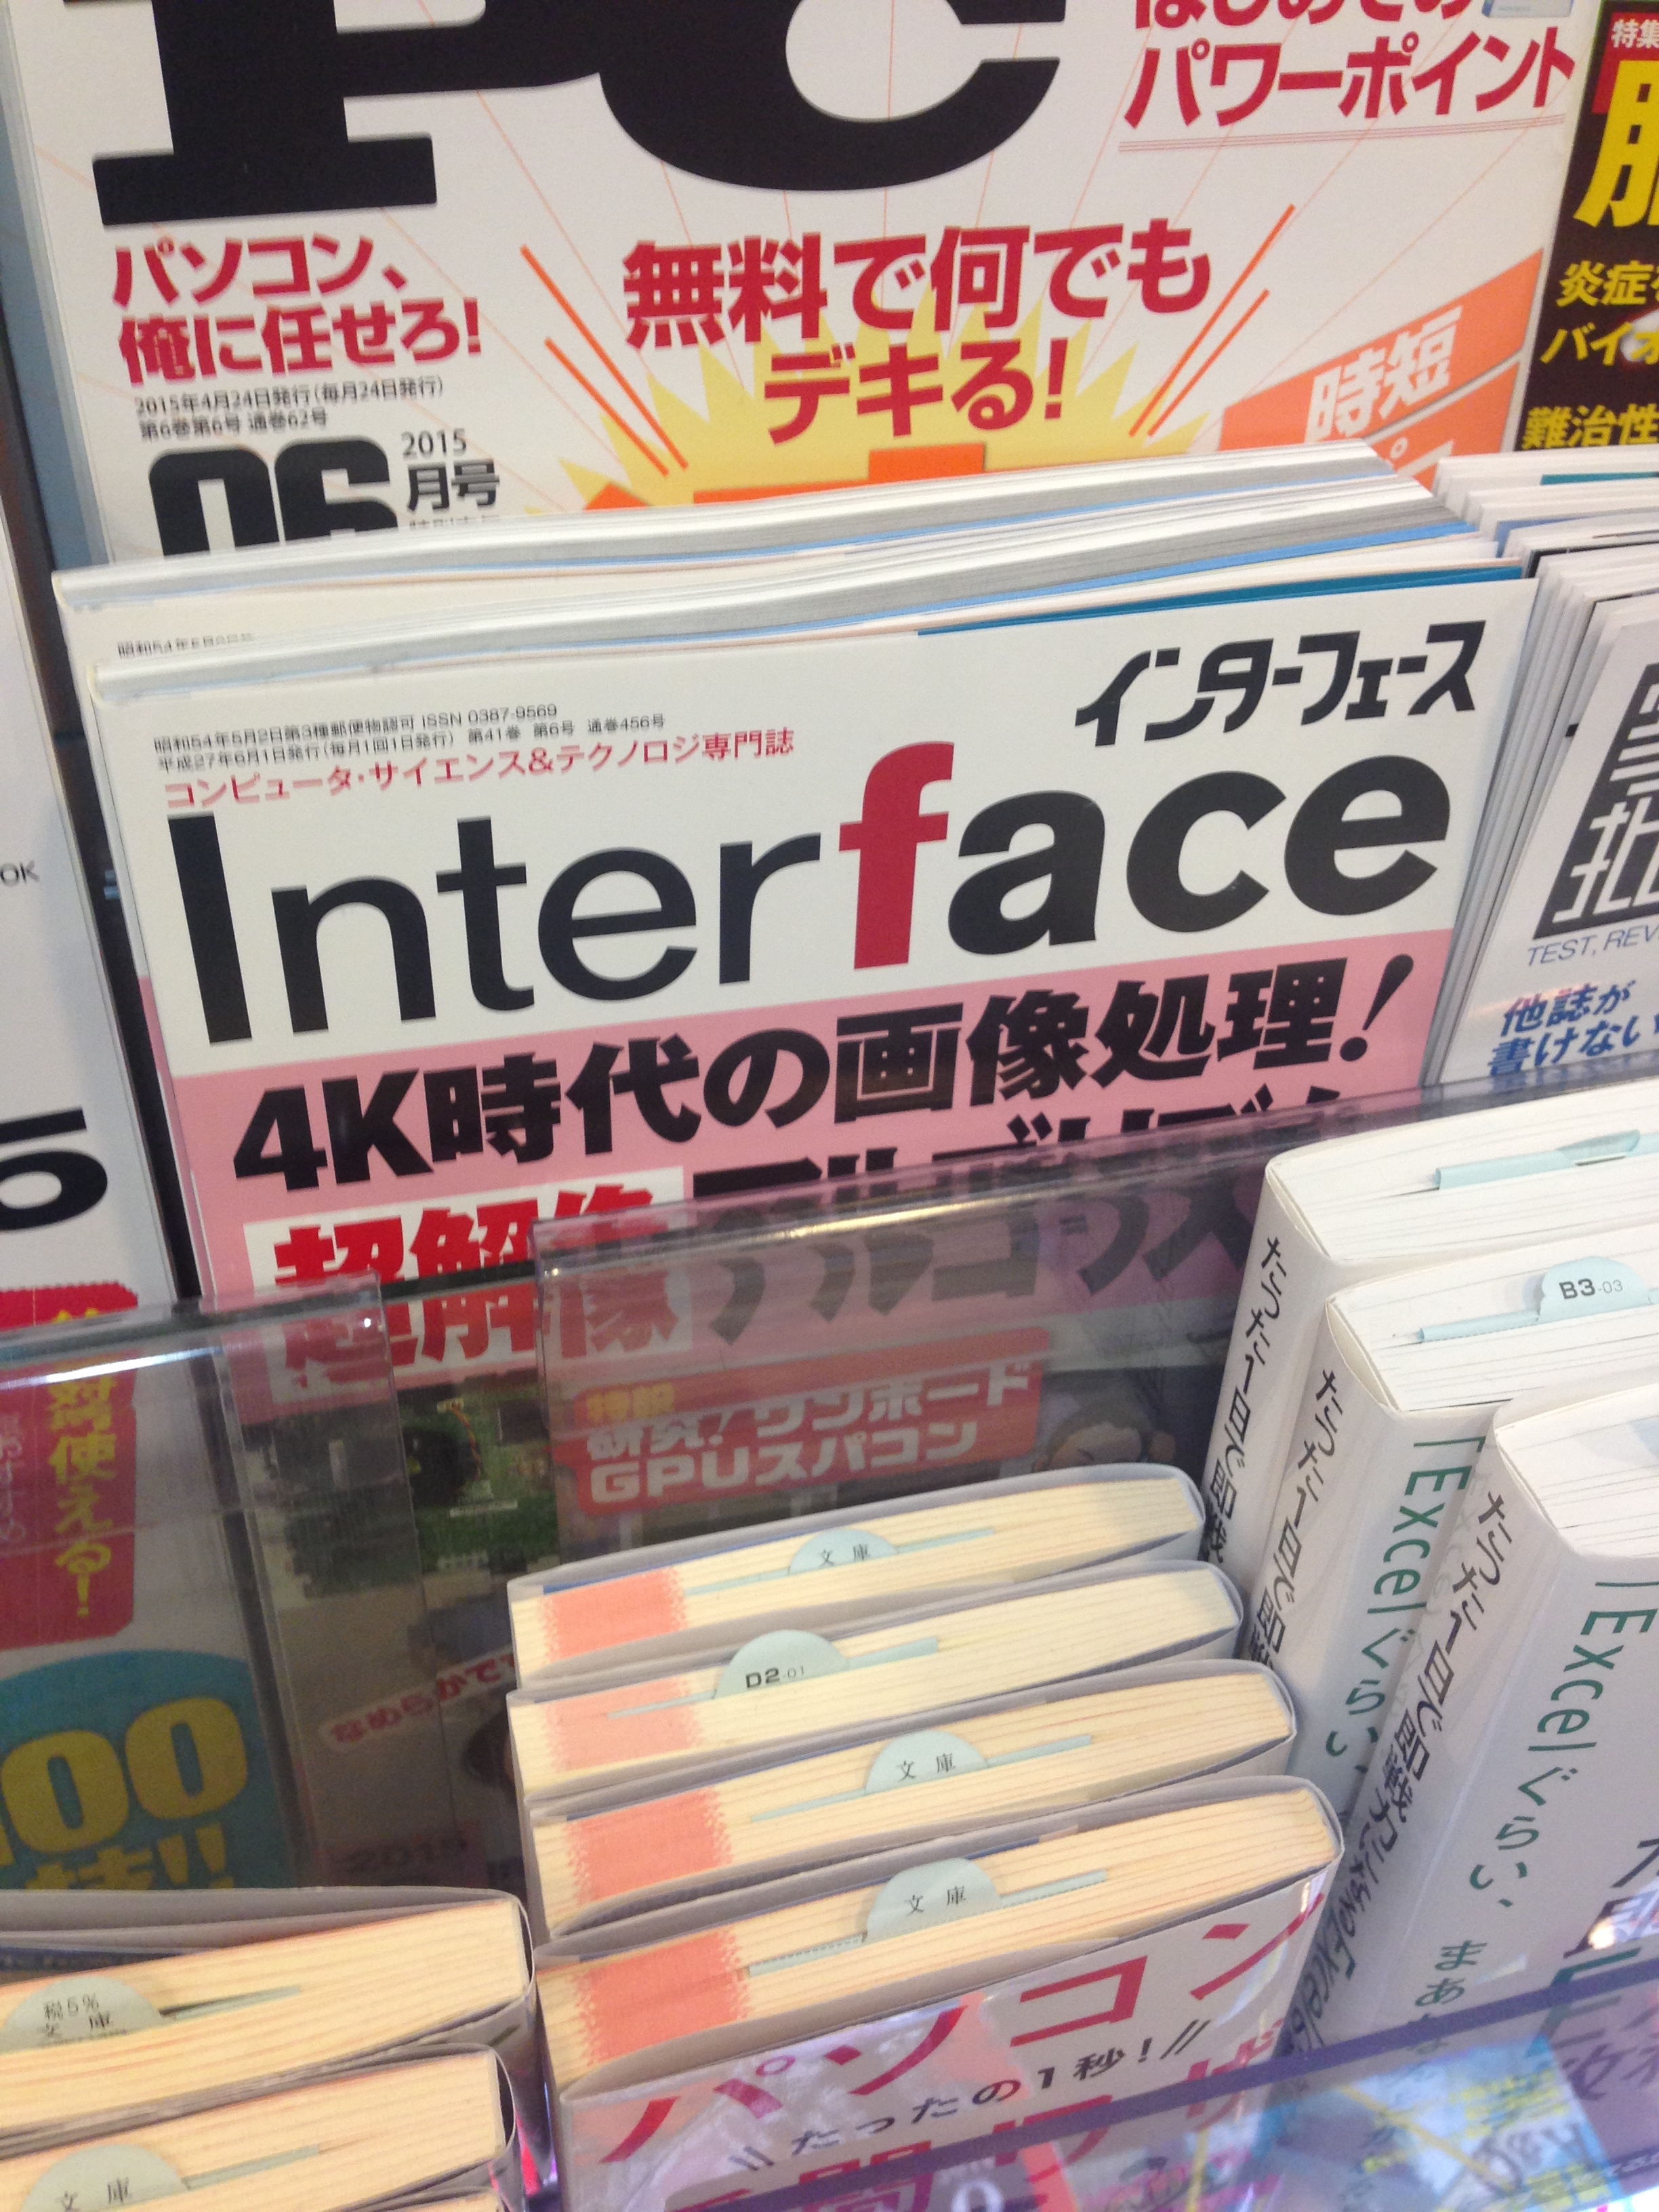 CQ出版 Interface誌に超解像の記事が掲載